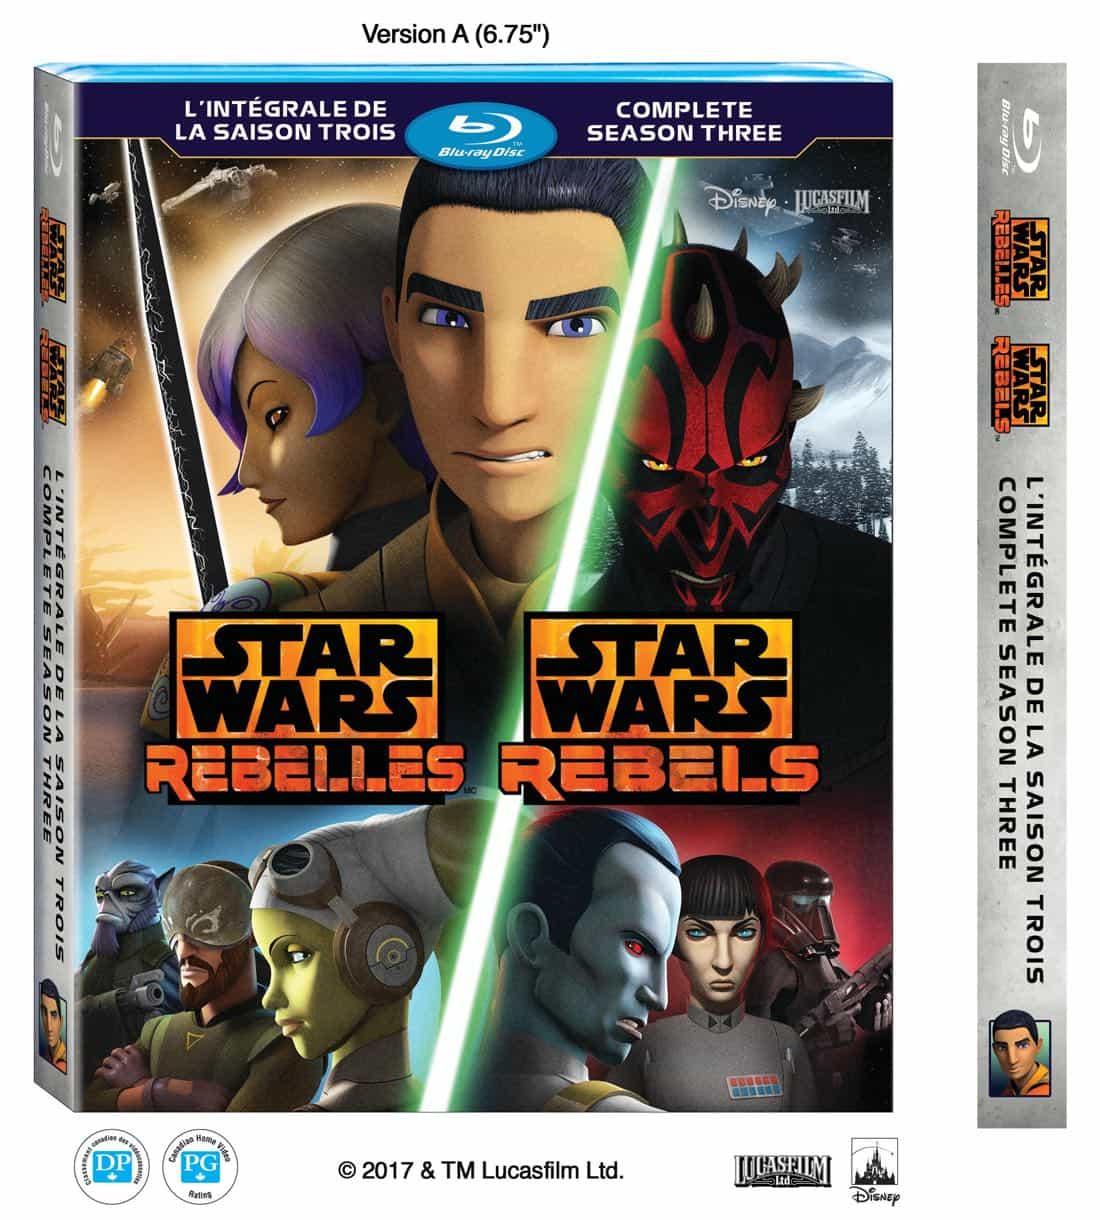 STAR WARS REBELS Season 3 Blu-ray And DVD Release Details